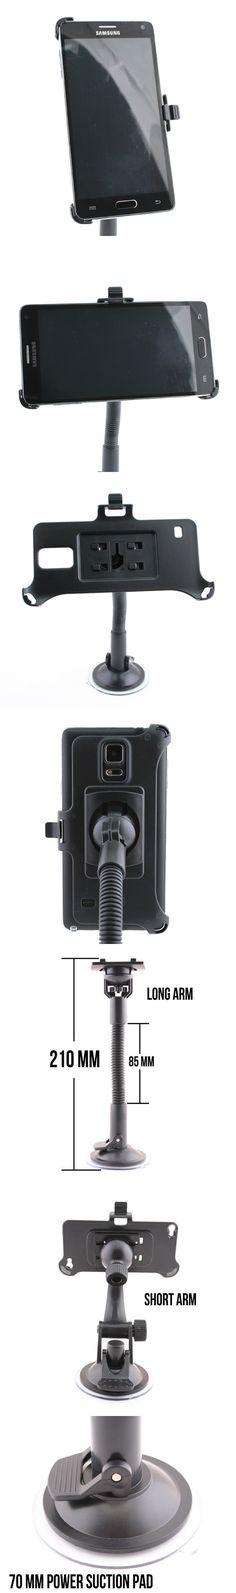 Samsung Galaxy Note 4 Car Windshield Mount http://www.usbgeek.com/products/galaxy-note4-mount